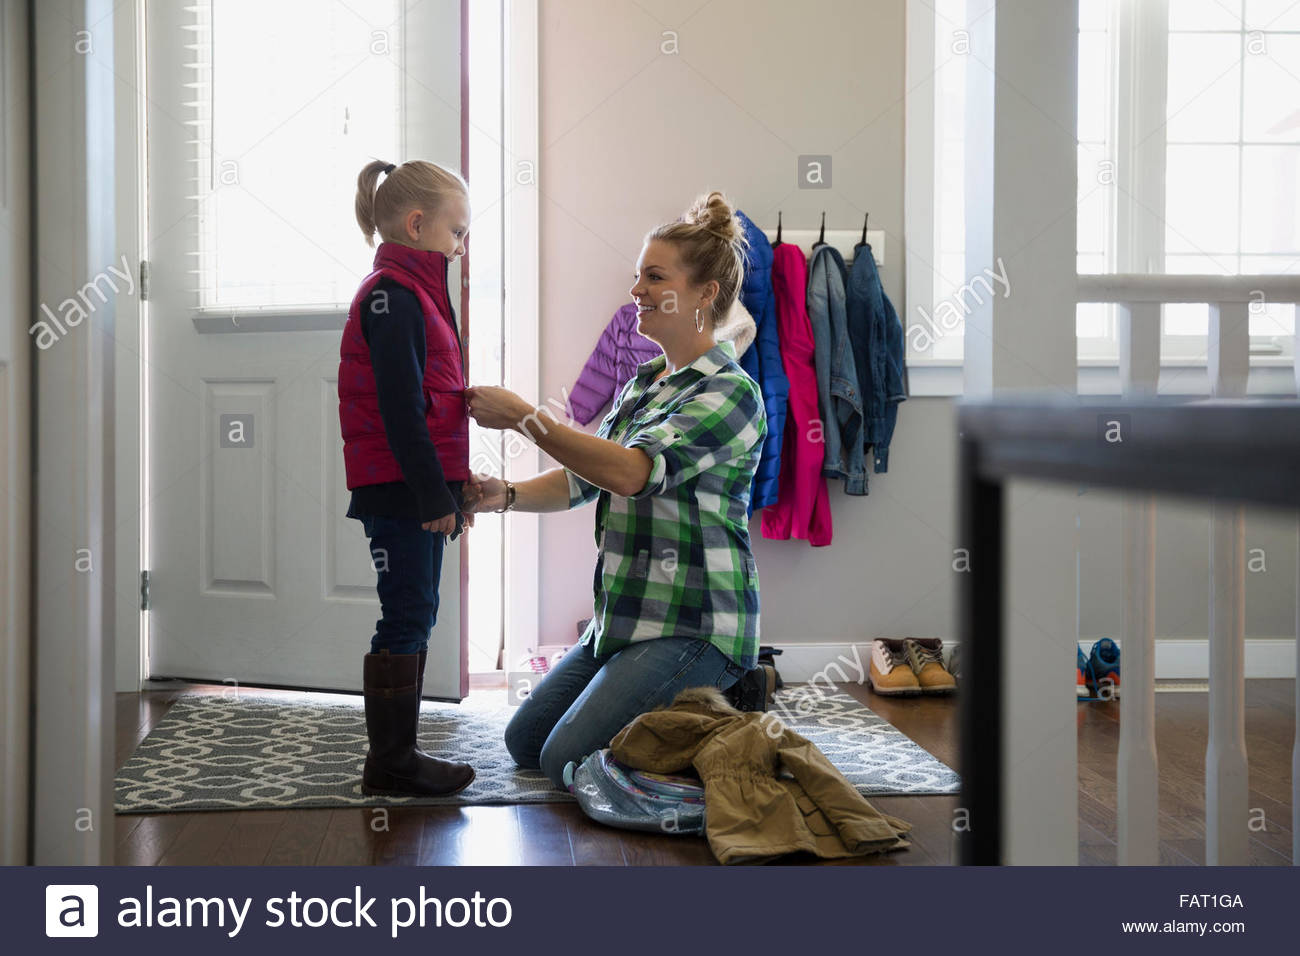 Mother zipping vest on daughter at front door - Stock Image